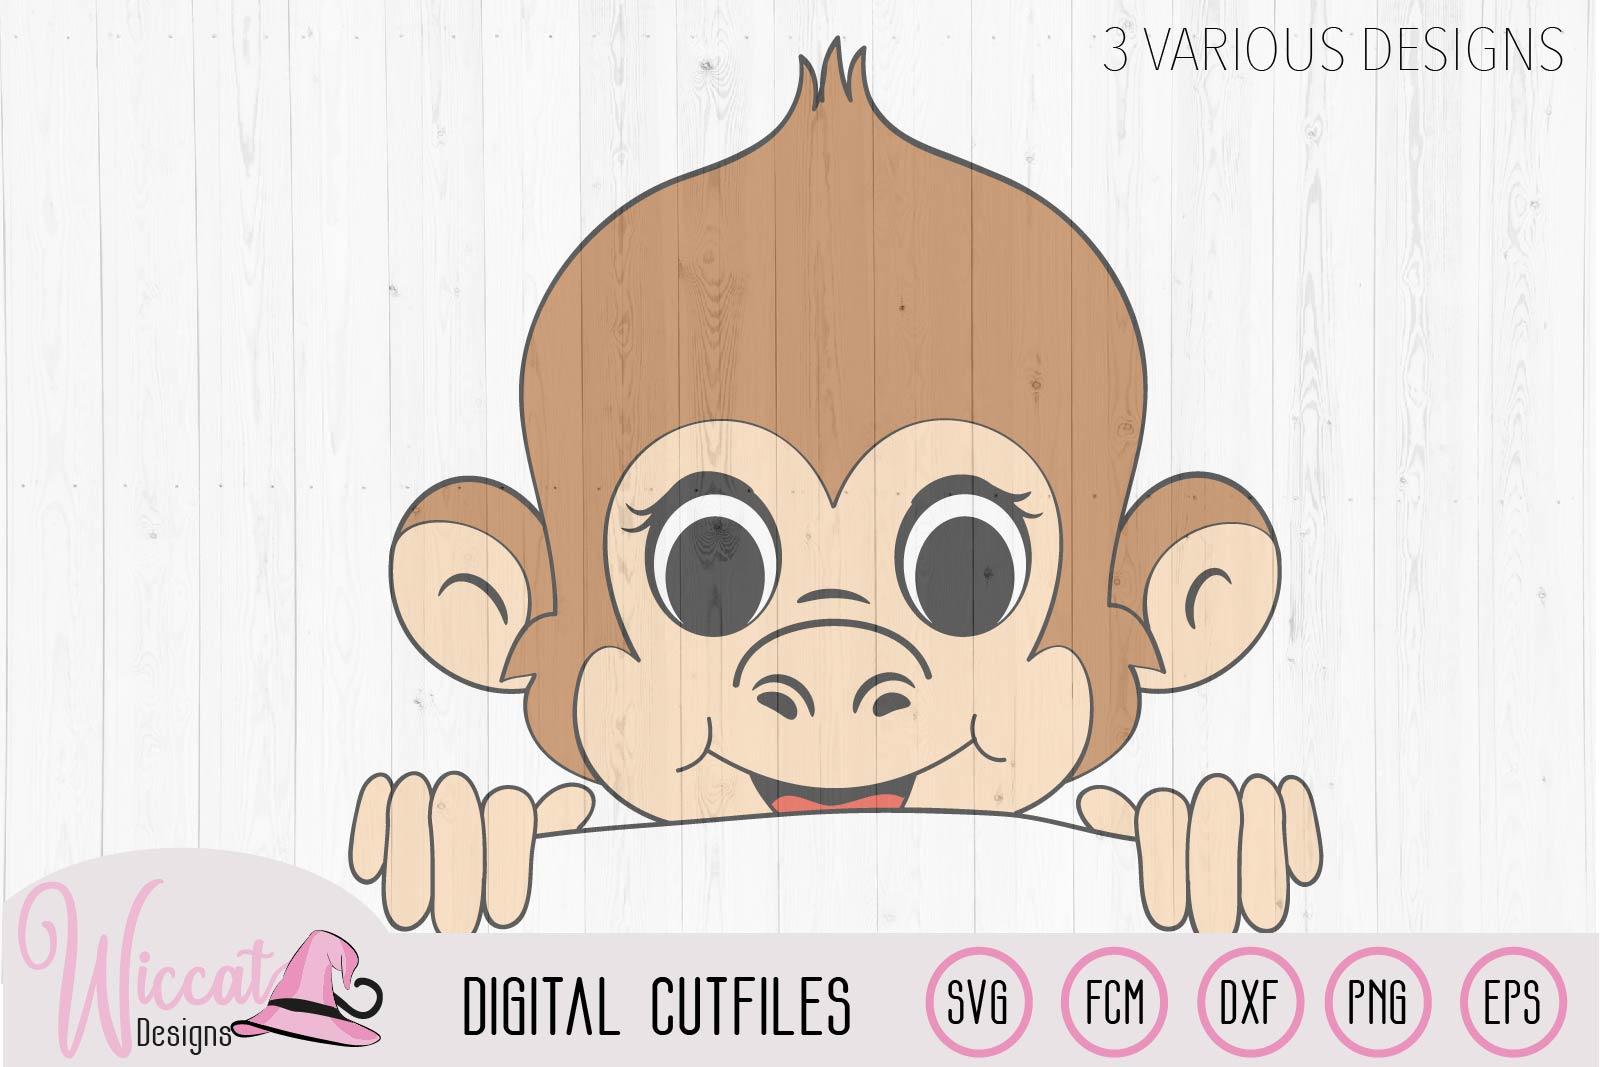 Peeka Boy monkey svg, monkey with cap, fcm cut file example image 2